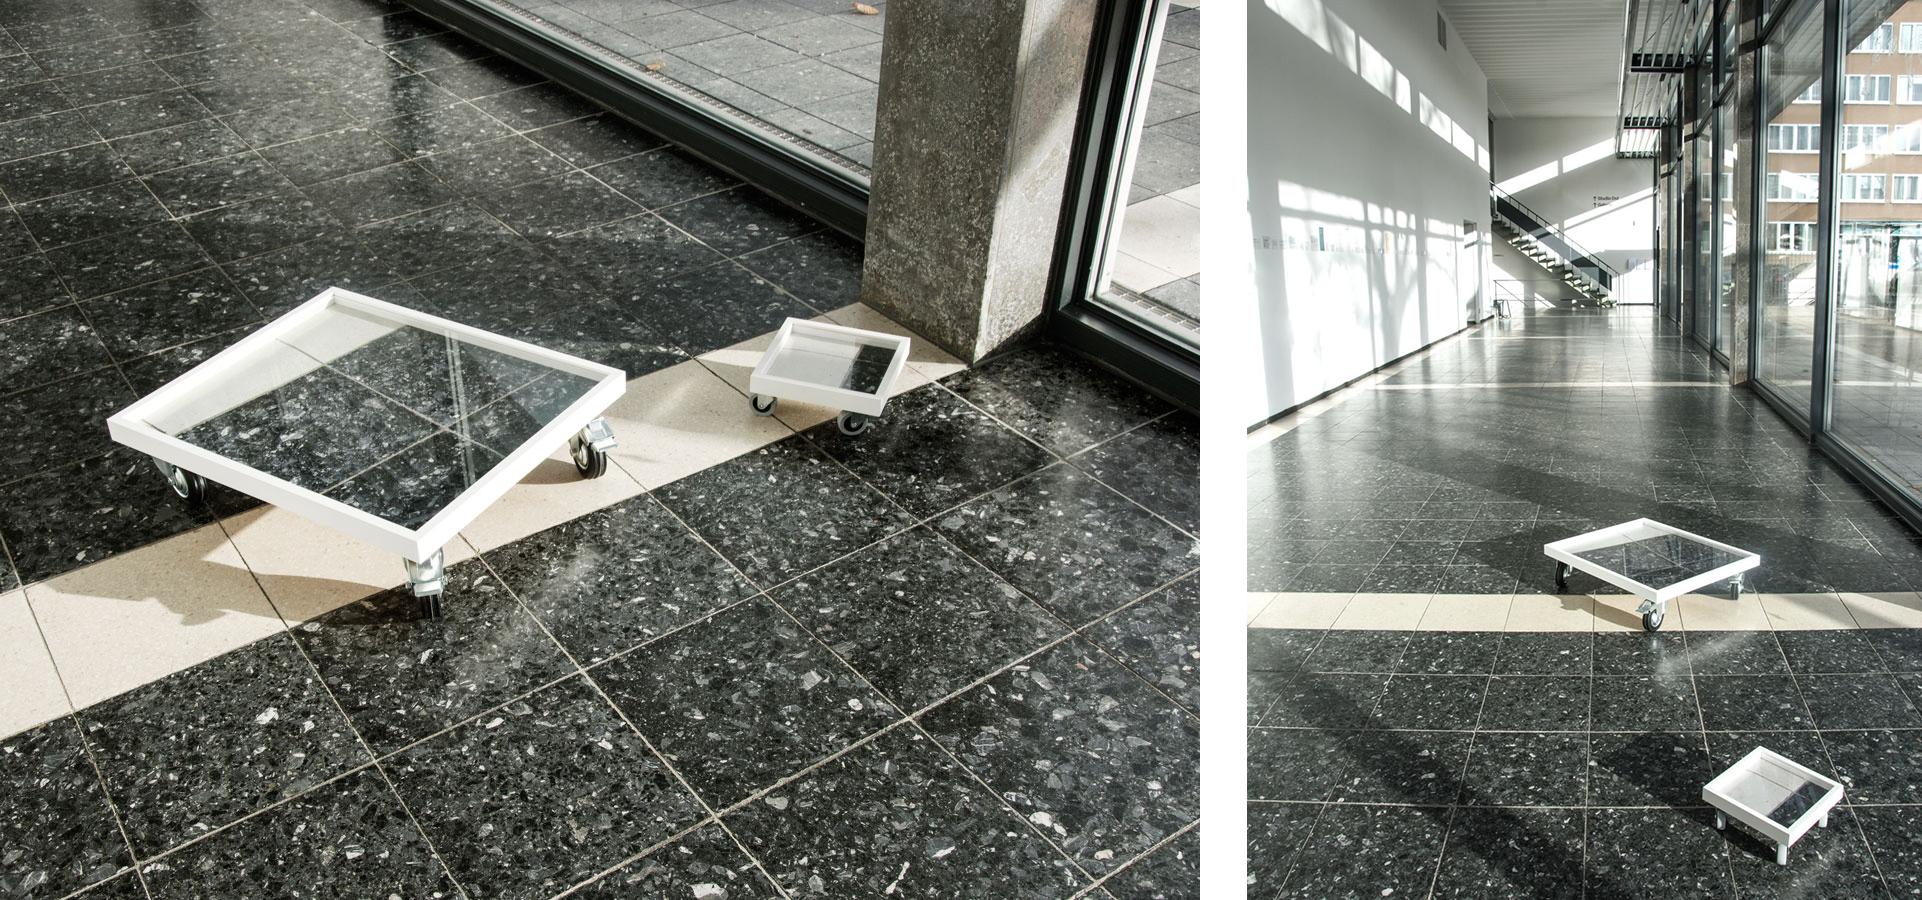 jonas-hohnke.r-b.kunsthalle-darmstadt.foyer-raum1.1